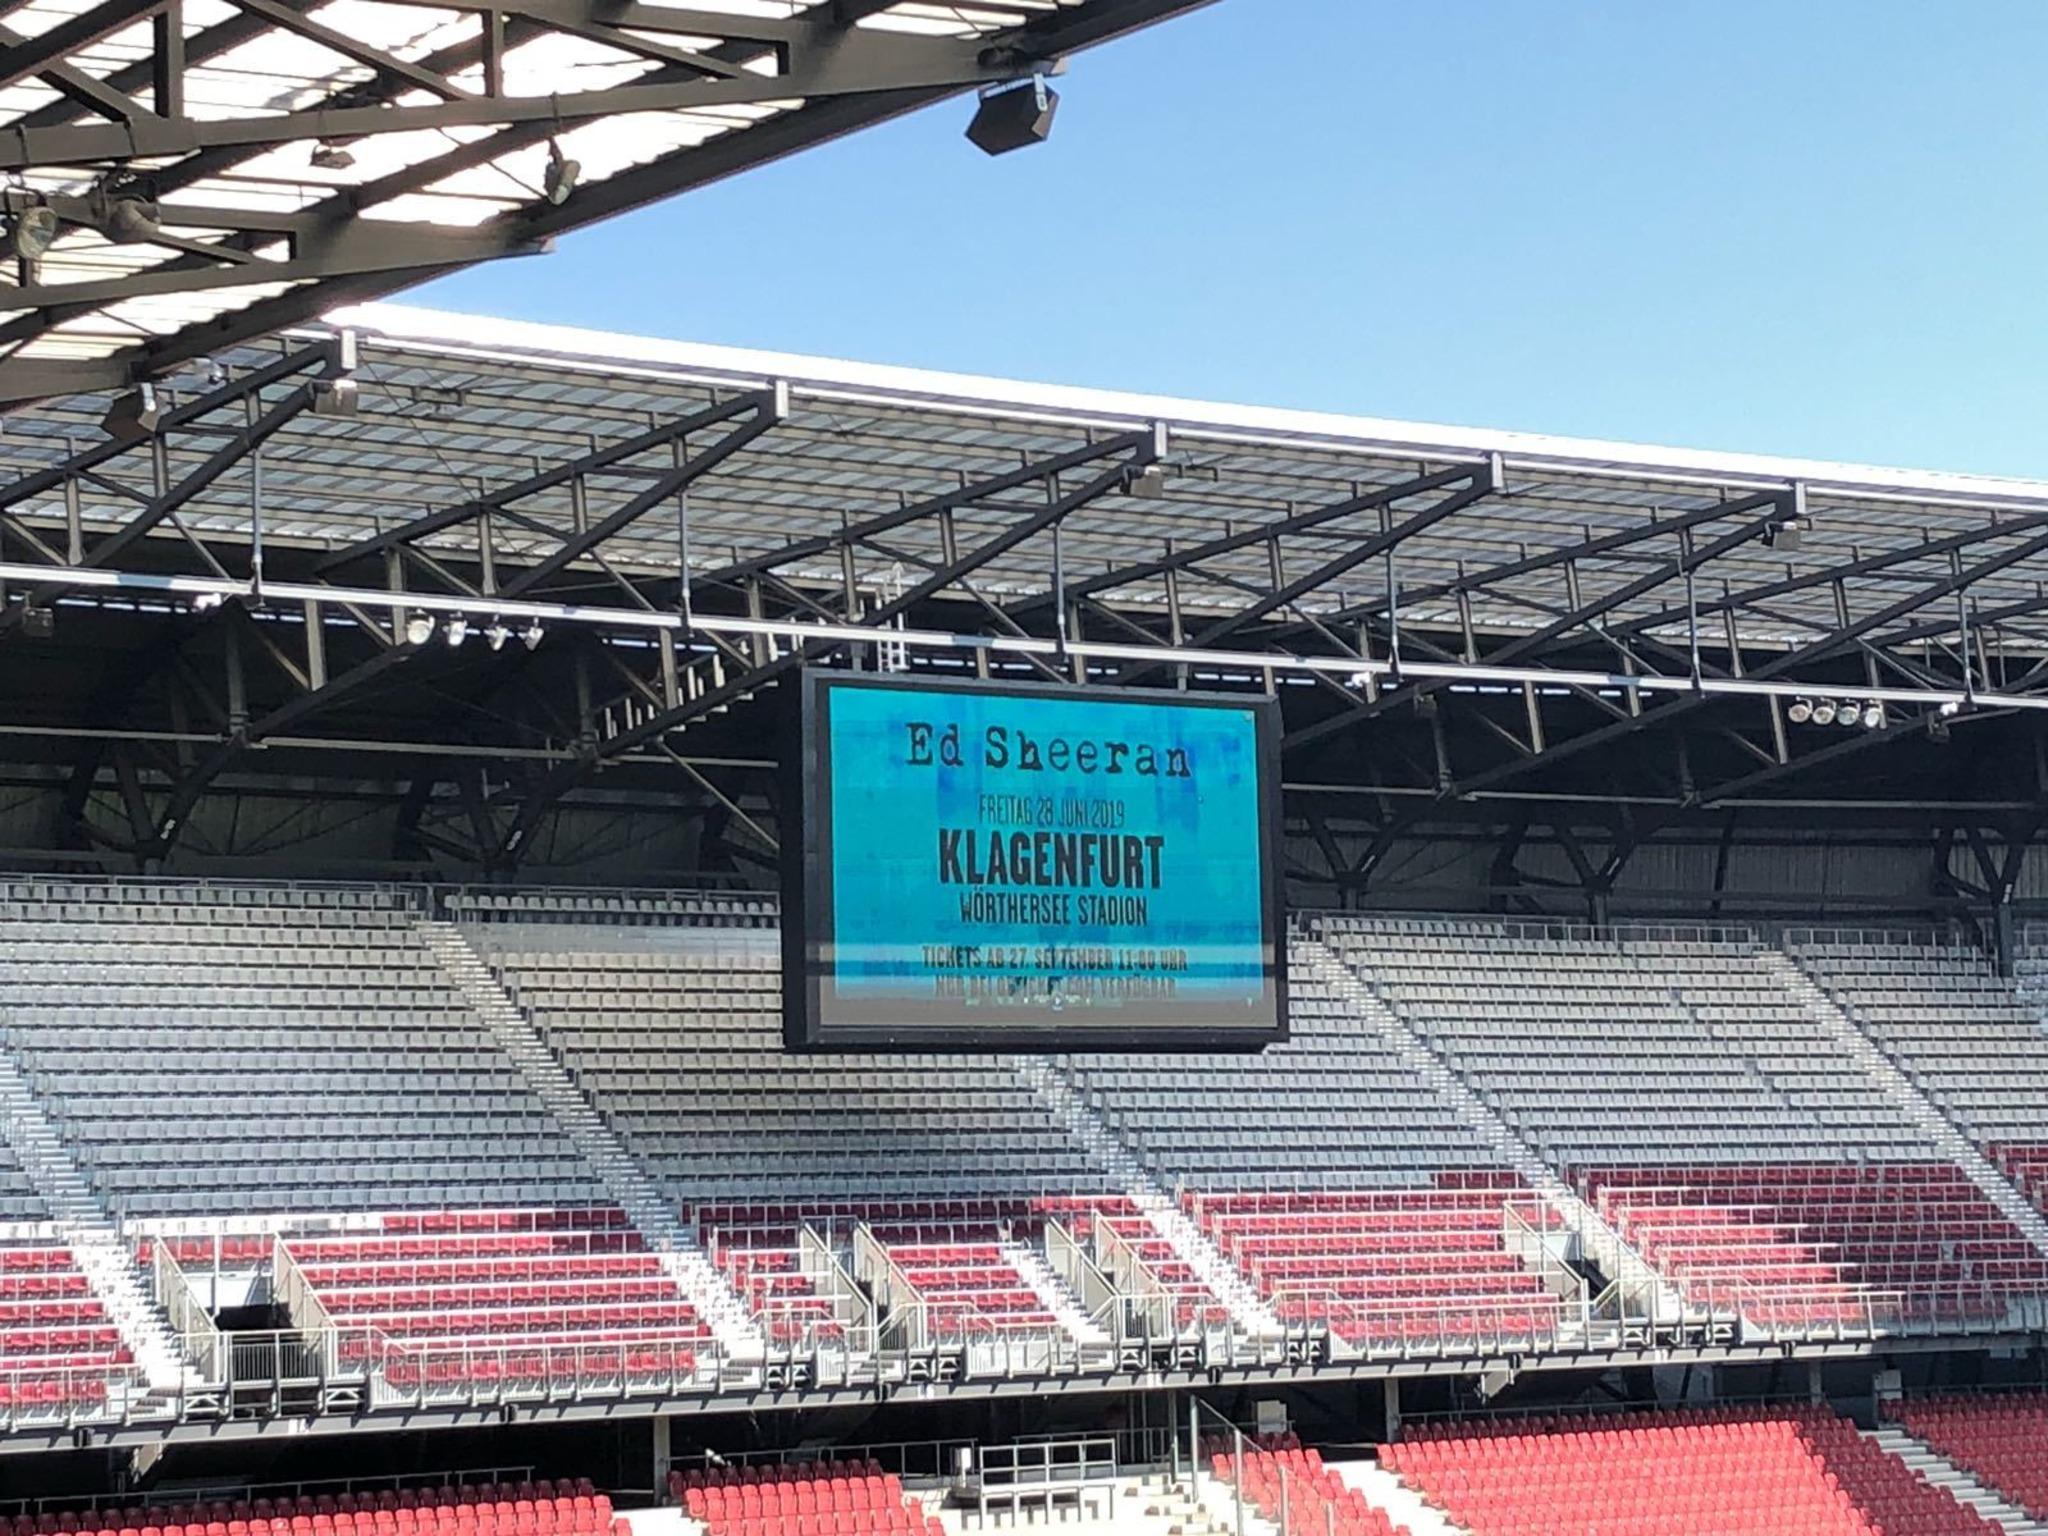 Ed Sheeran 2019 im Wörthersee Stadion - Klagenfurt c404cf18a0